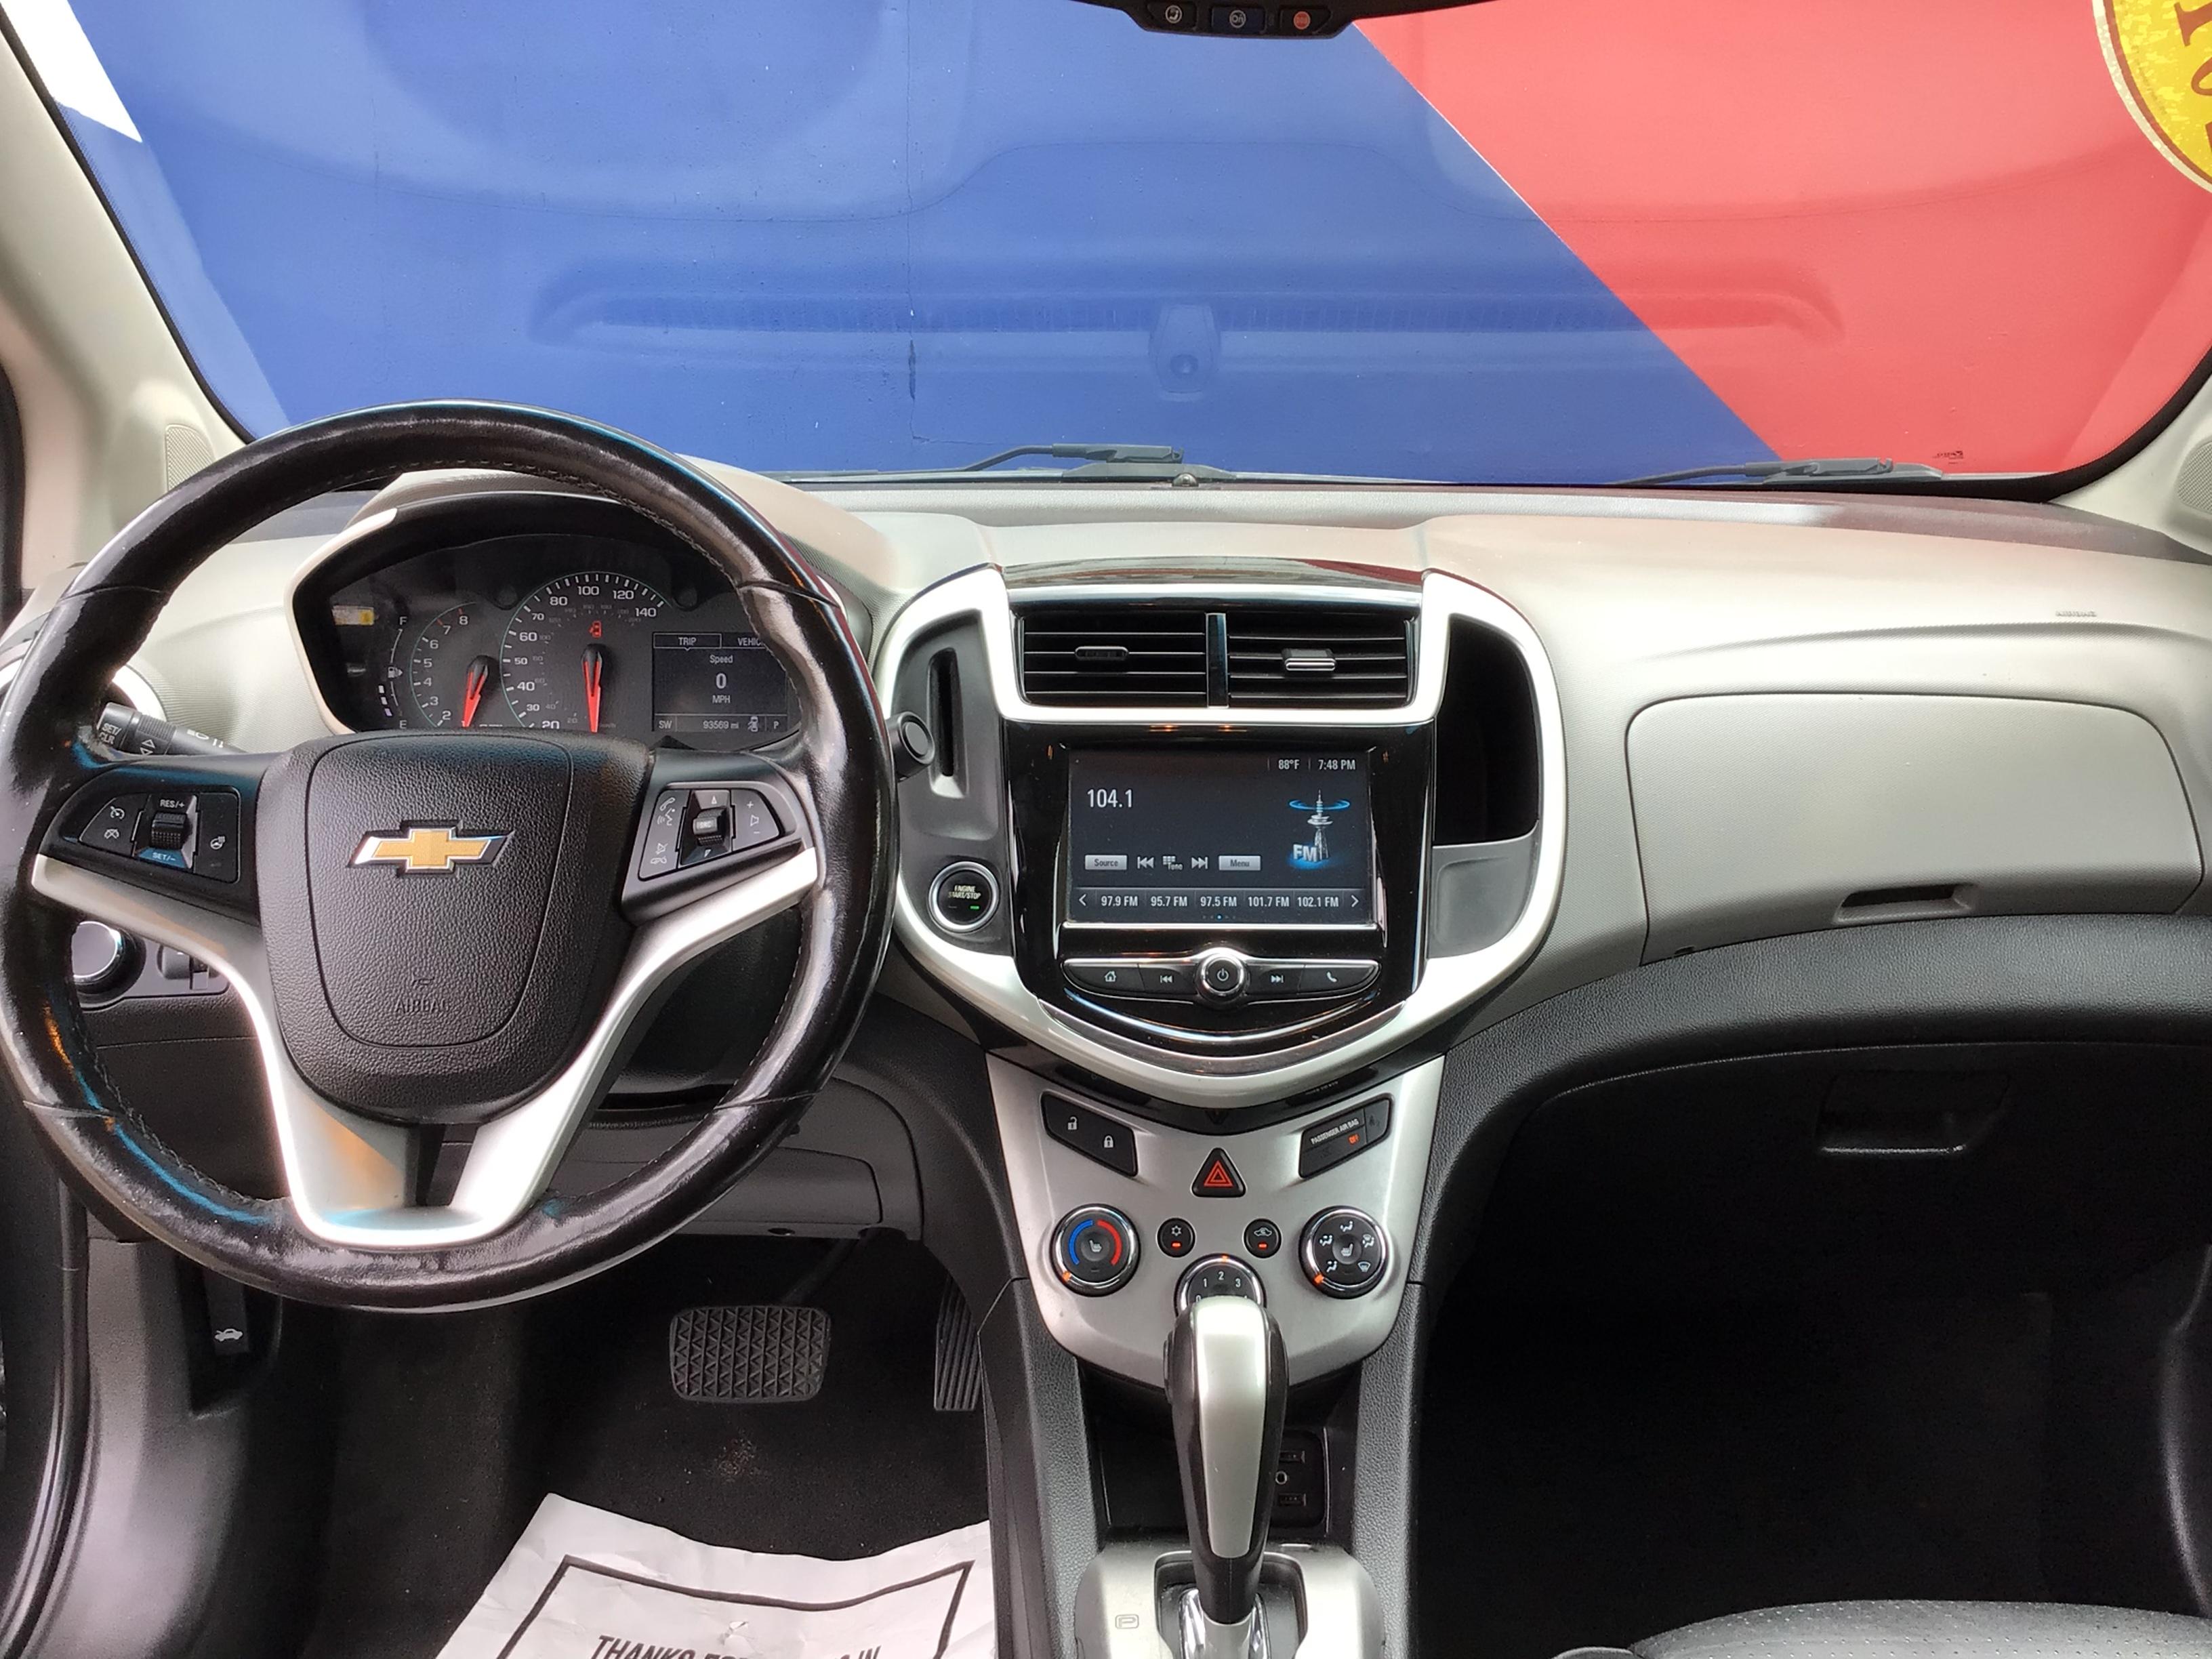 used vehicle - Sedan CHEVROLET SONIC 2017